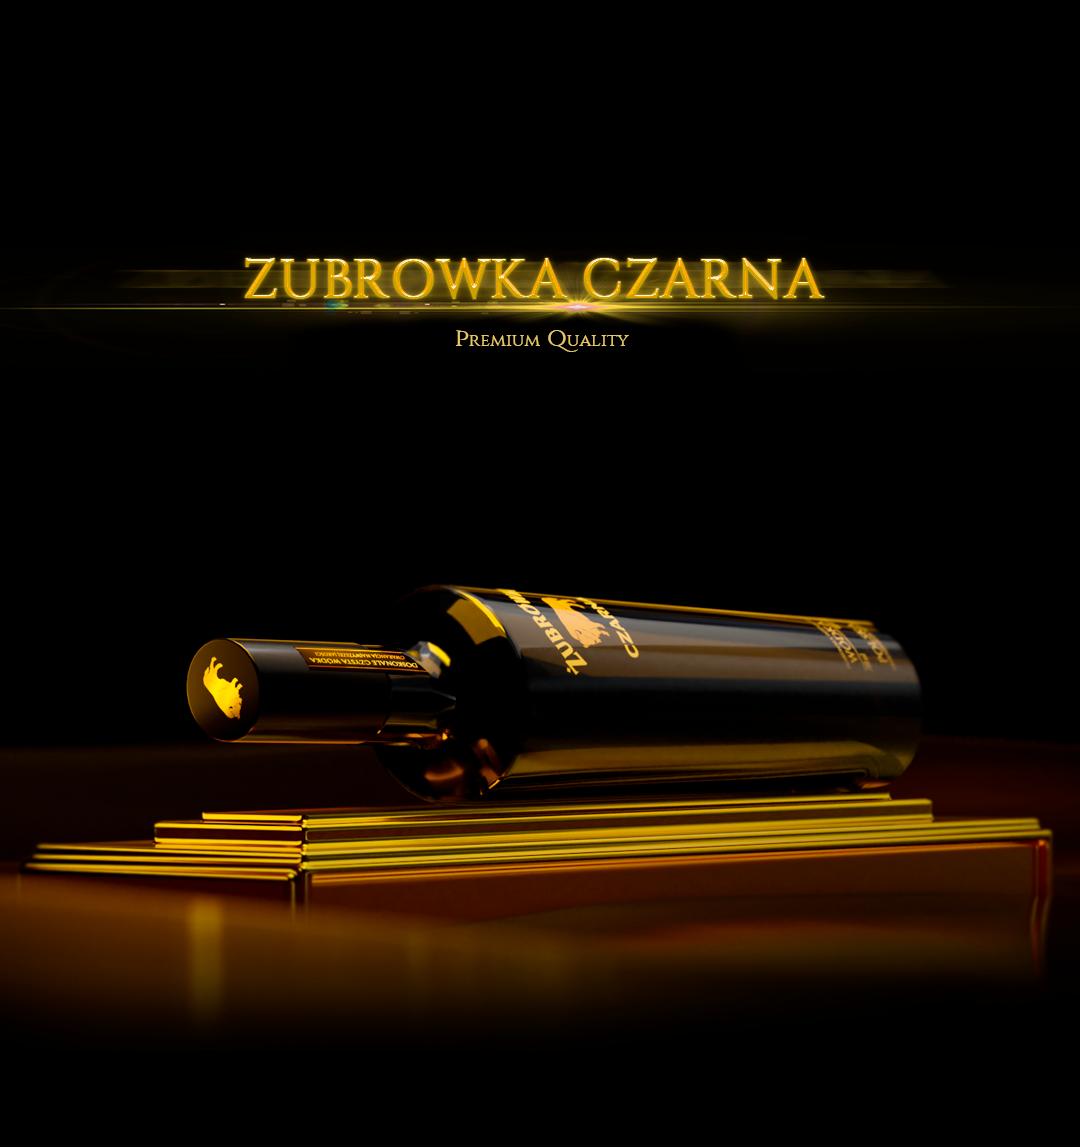 Zubrowka Czarna